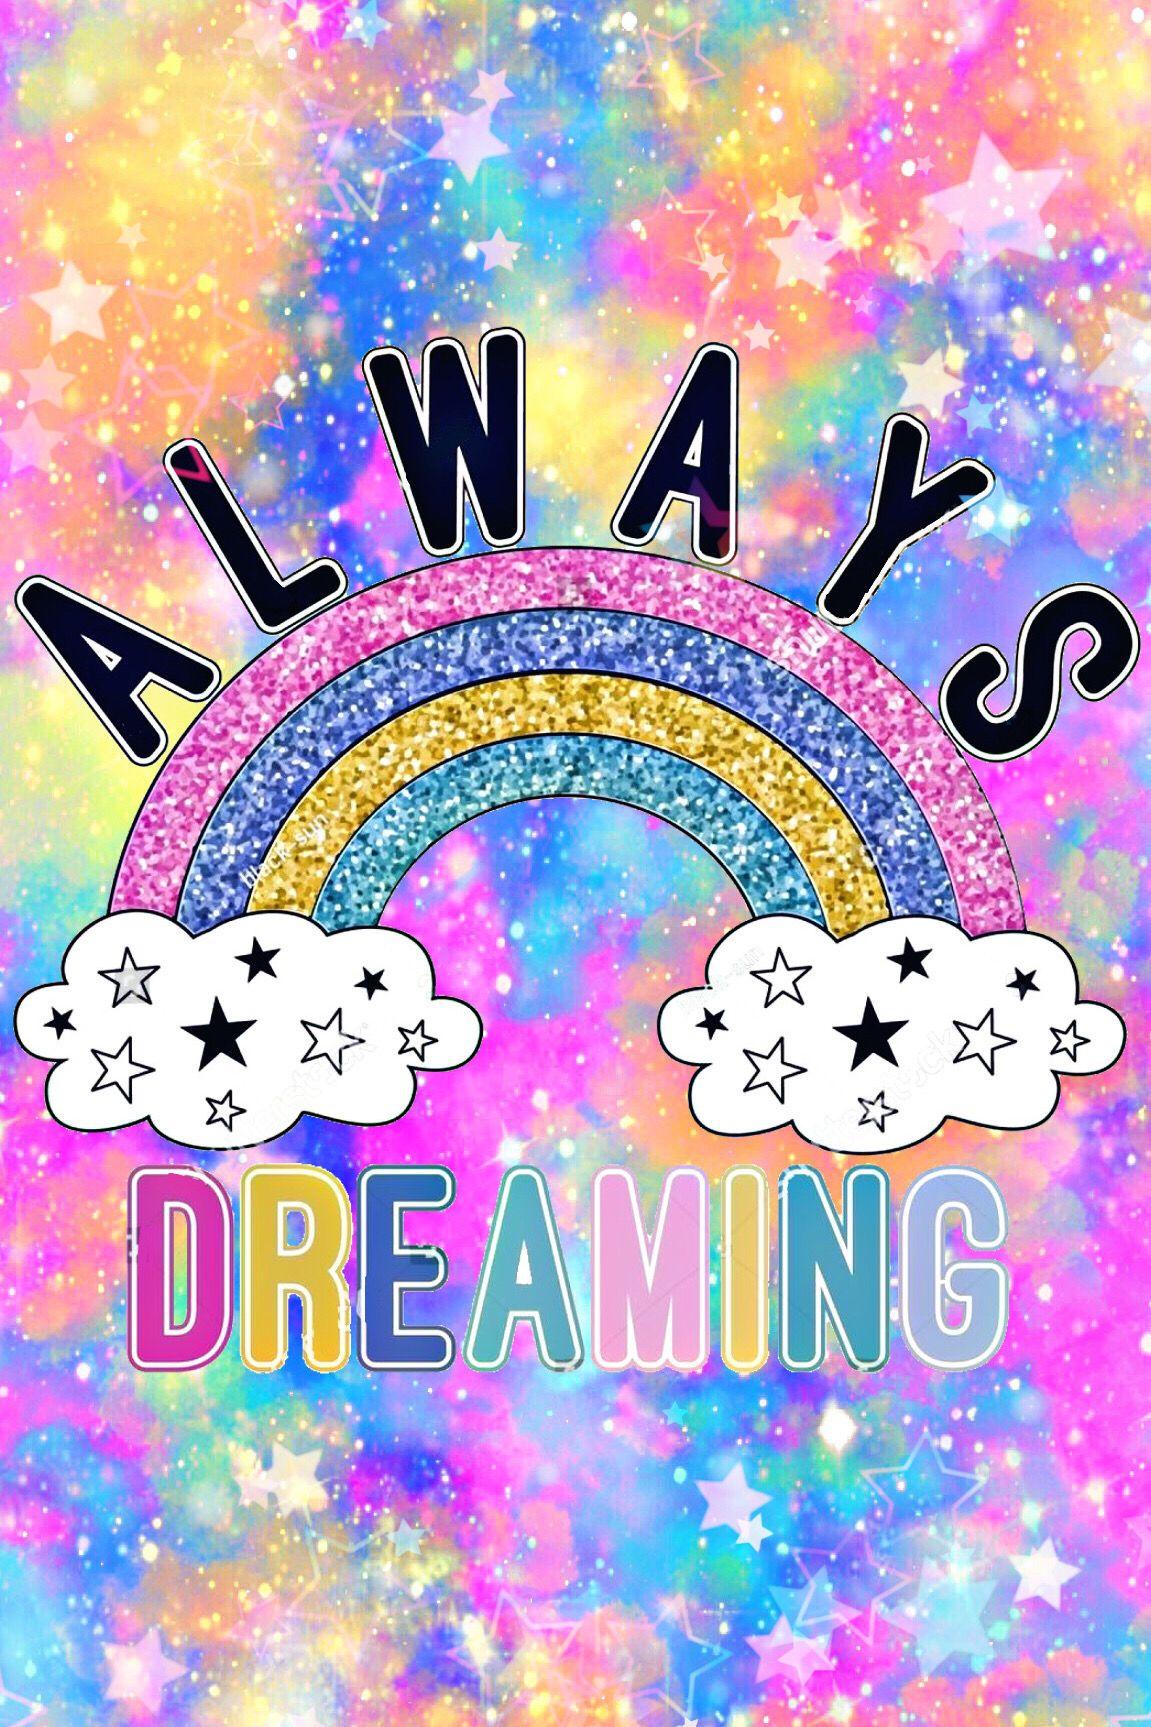 Rainbow Galaxy Wallpaper I Created For The App Cocoppa Galaxy Wallpaper Glitter Wallpaper Rainbow Galaxy